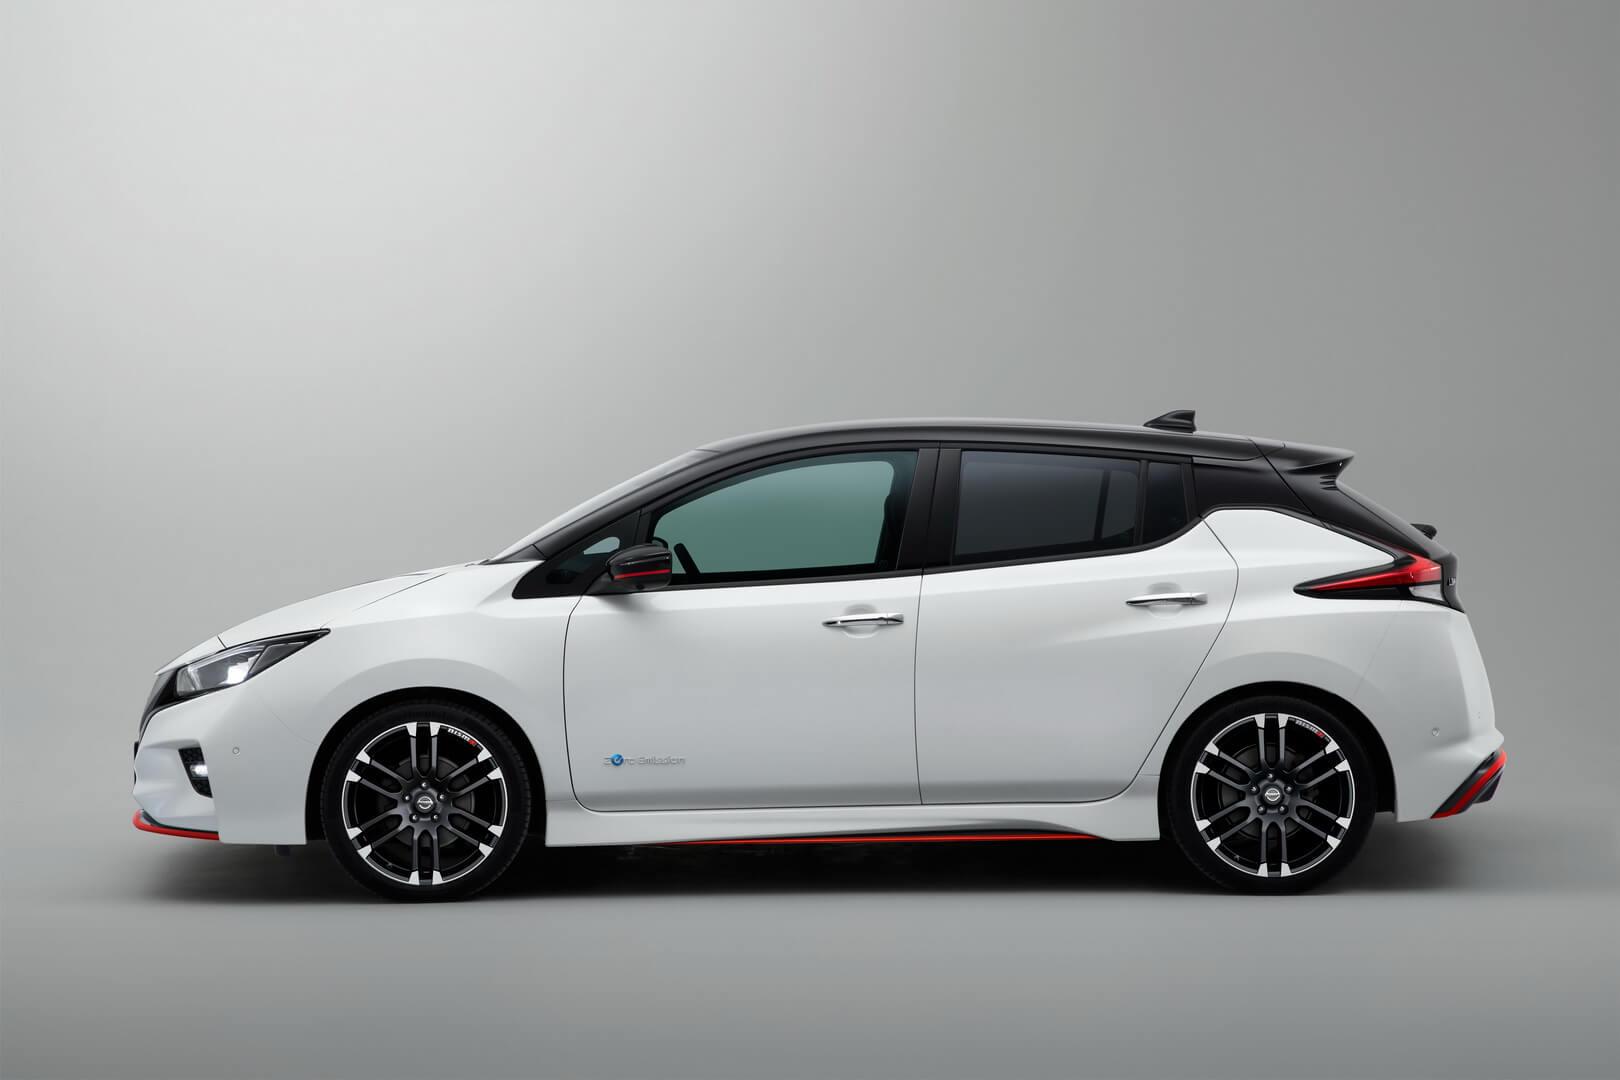 Електричний спорткар Nissan Leaf Nismo